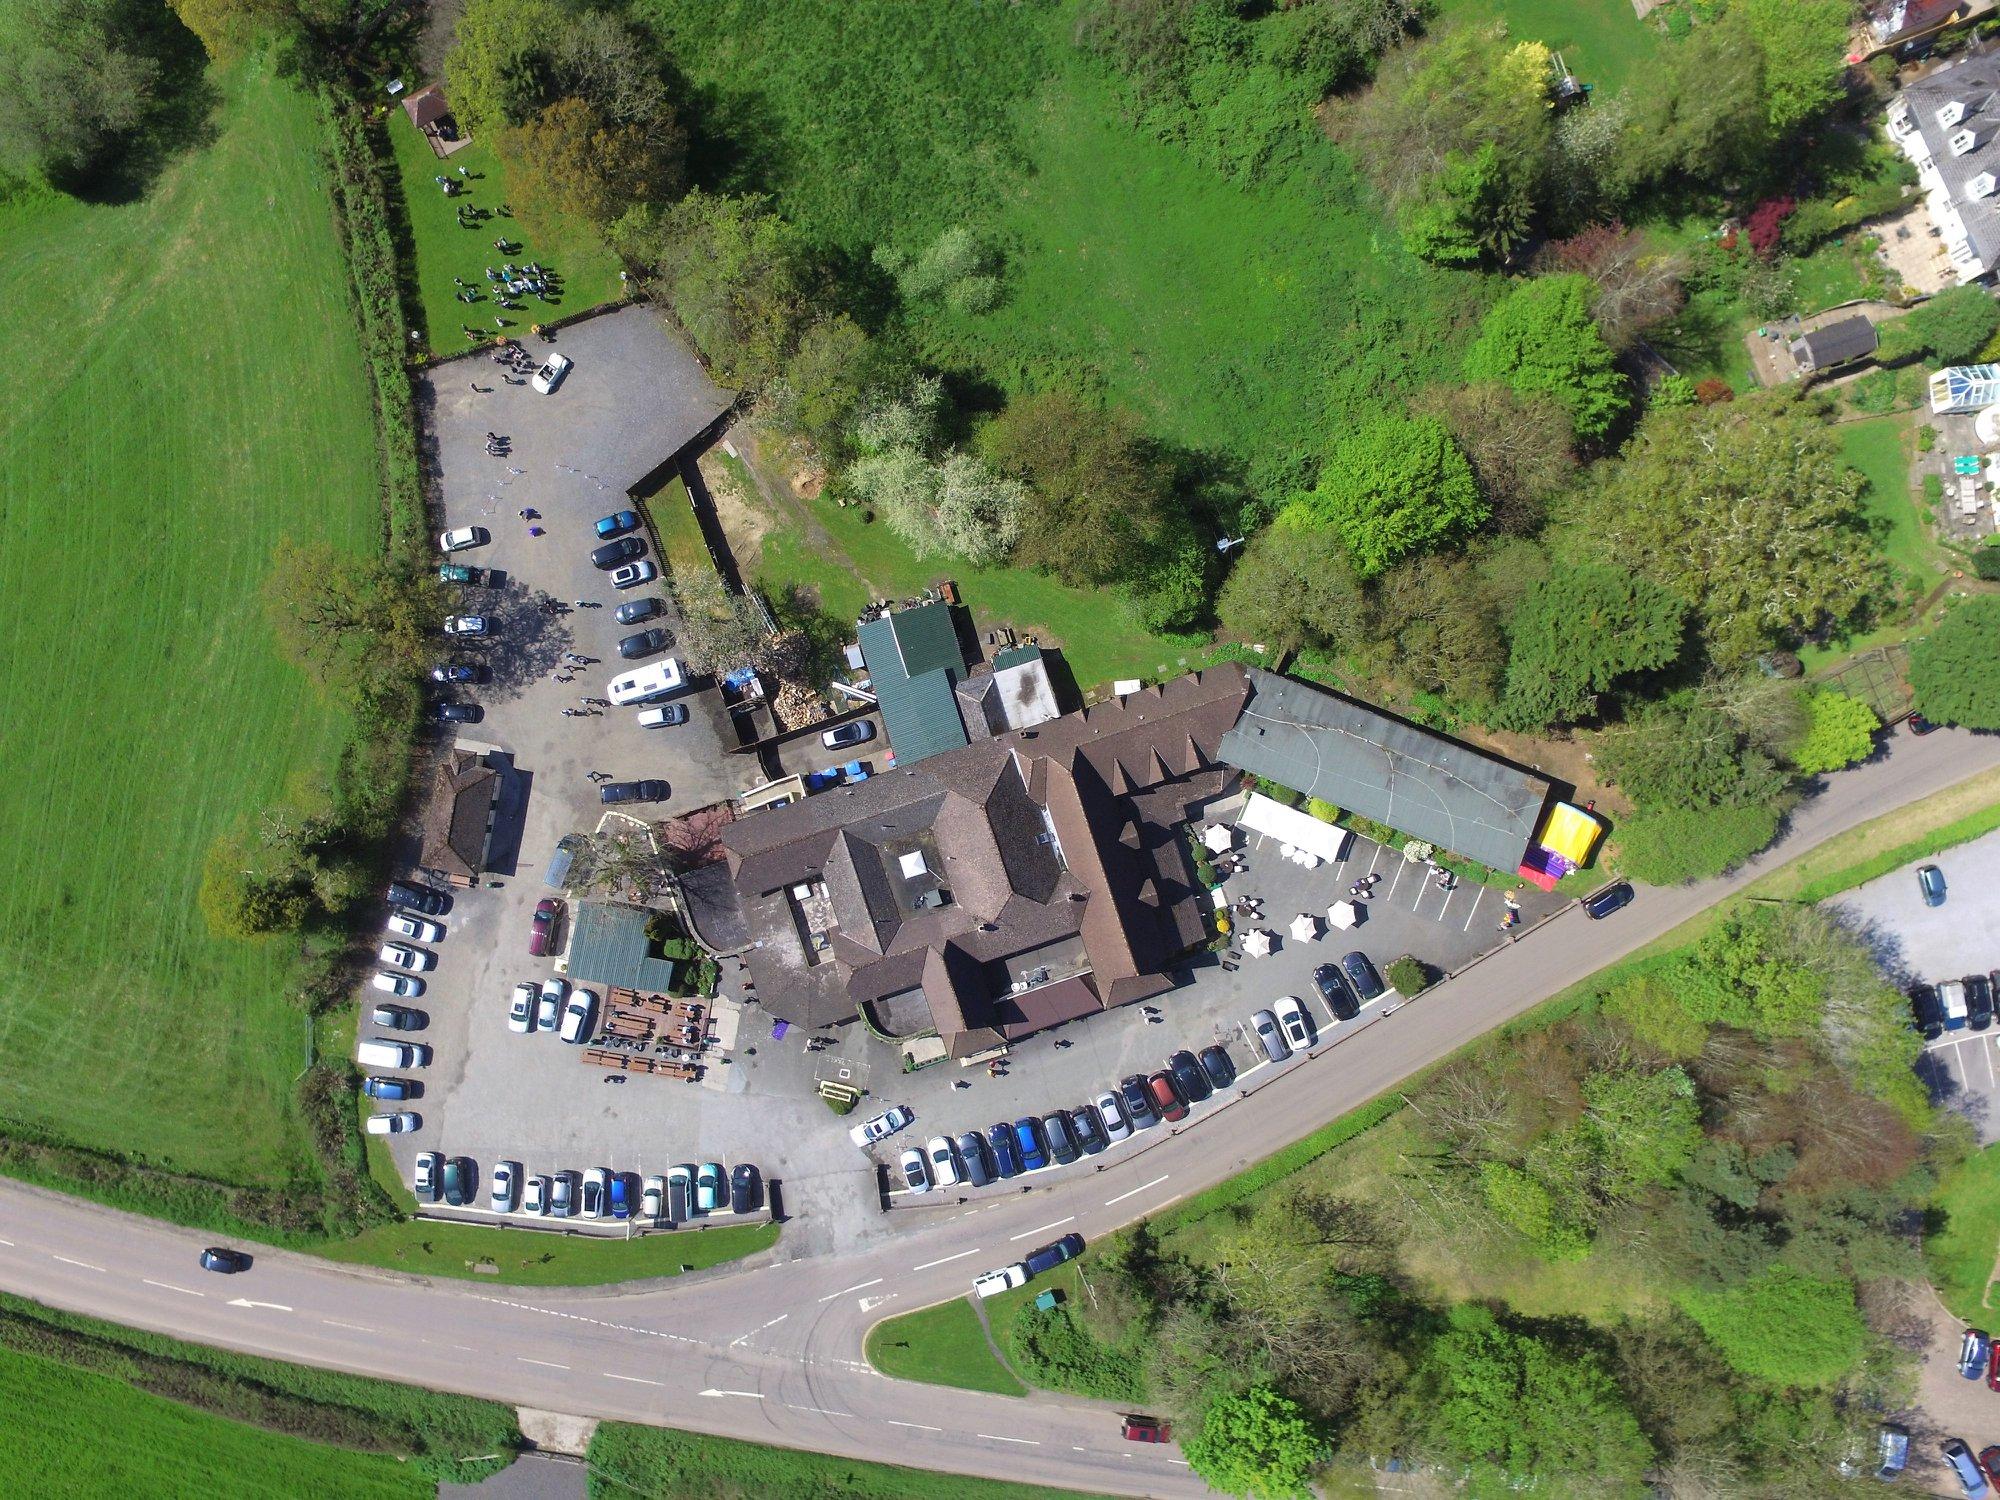 Leisure Ashburton, TQ13 7JW - The Dartmoor Lodge